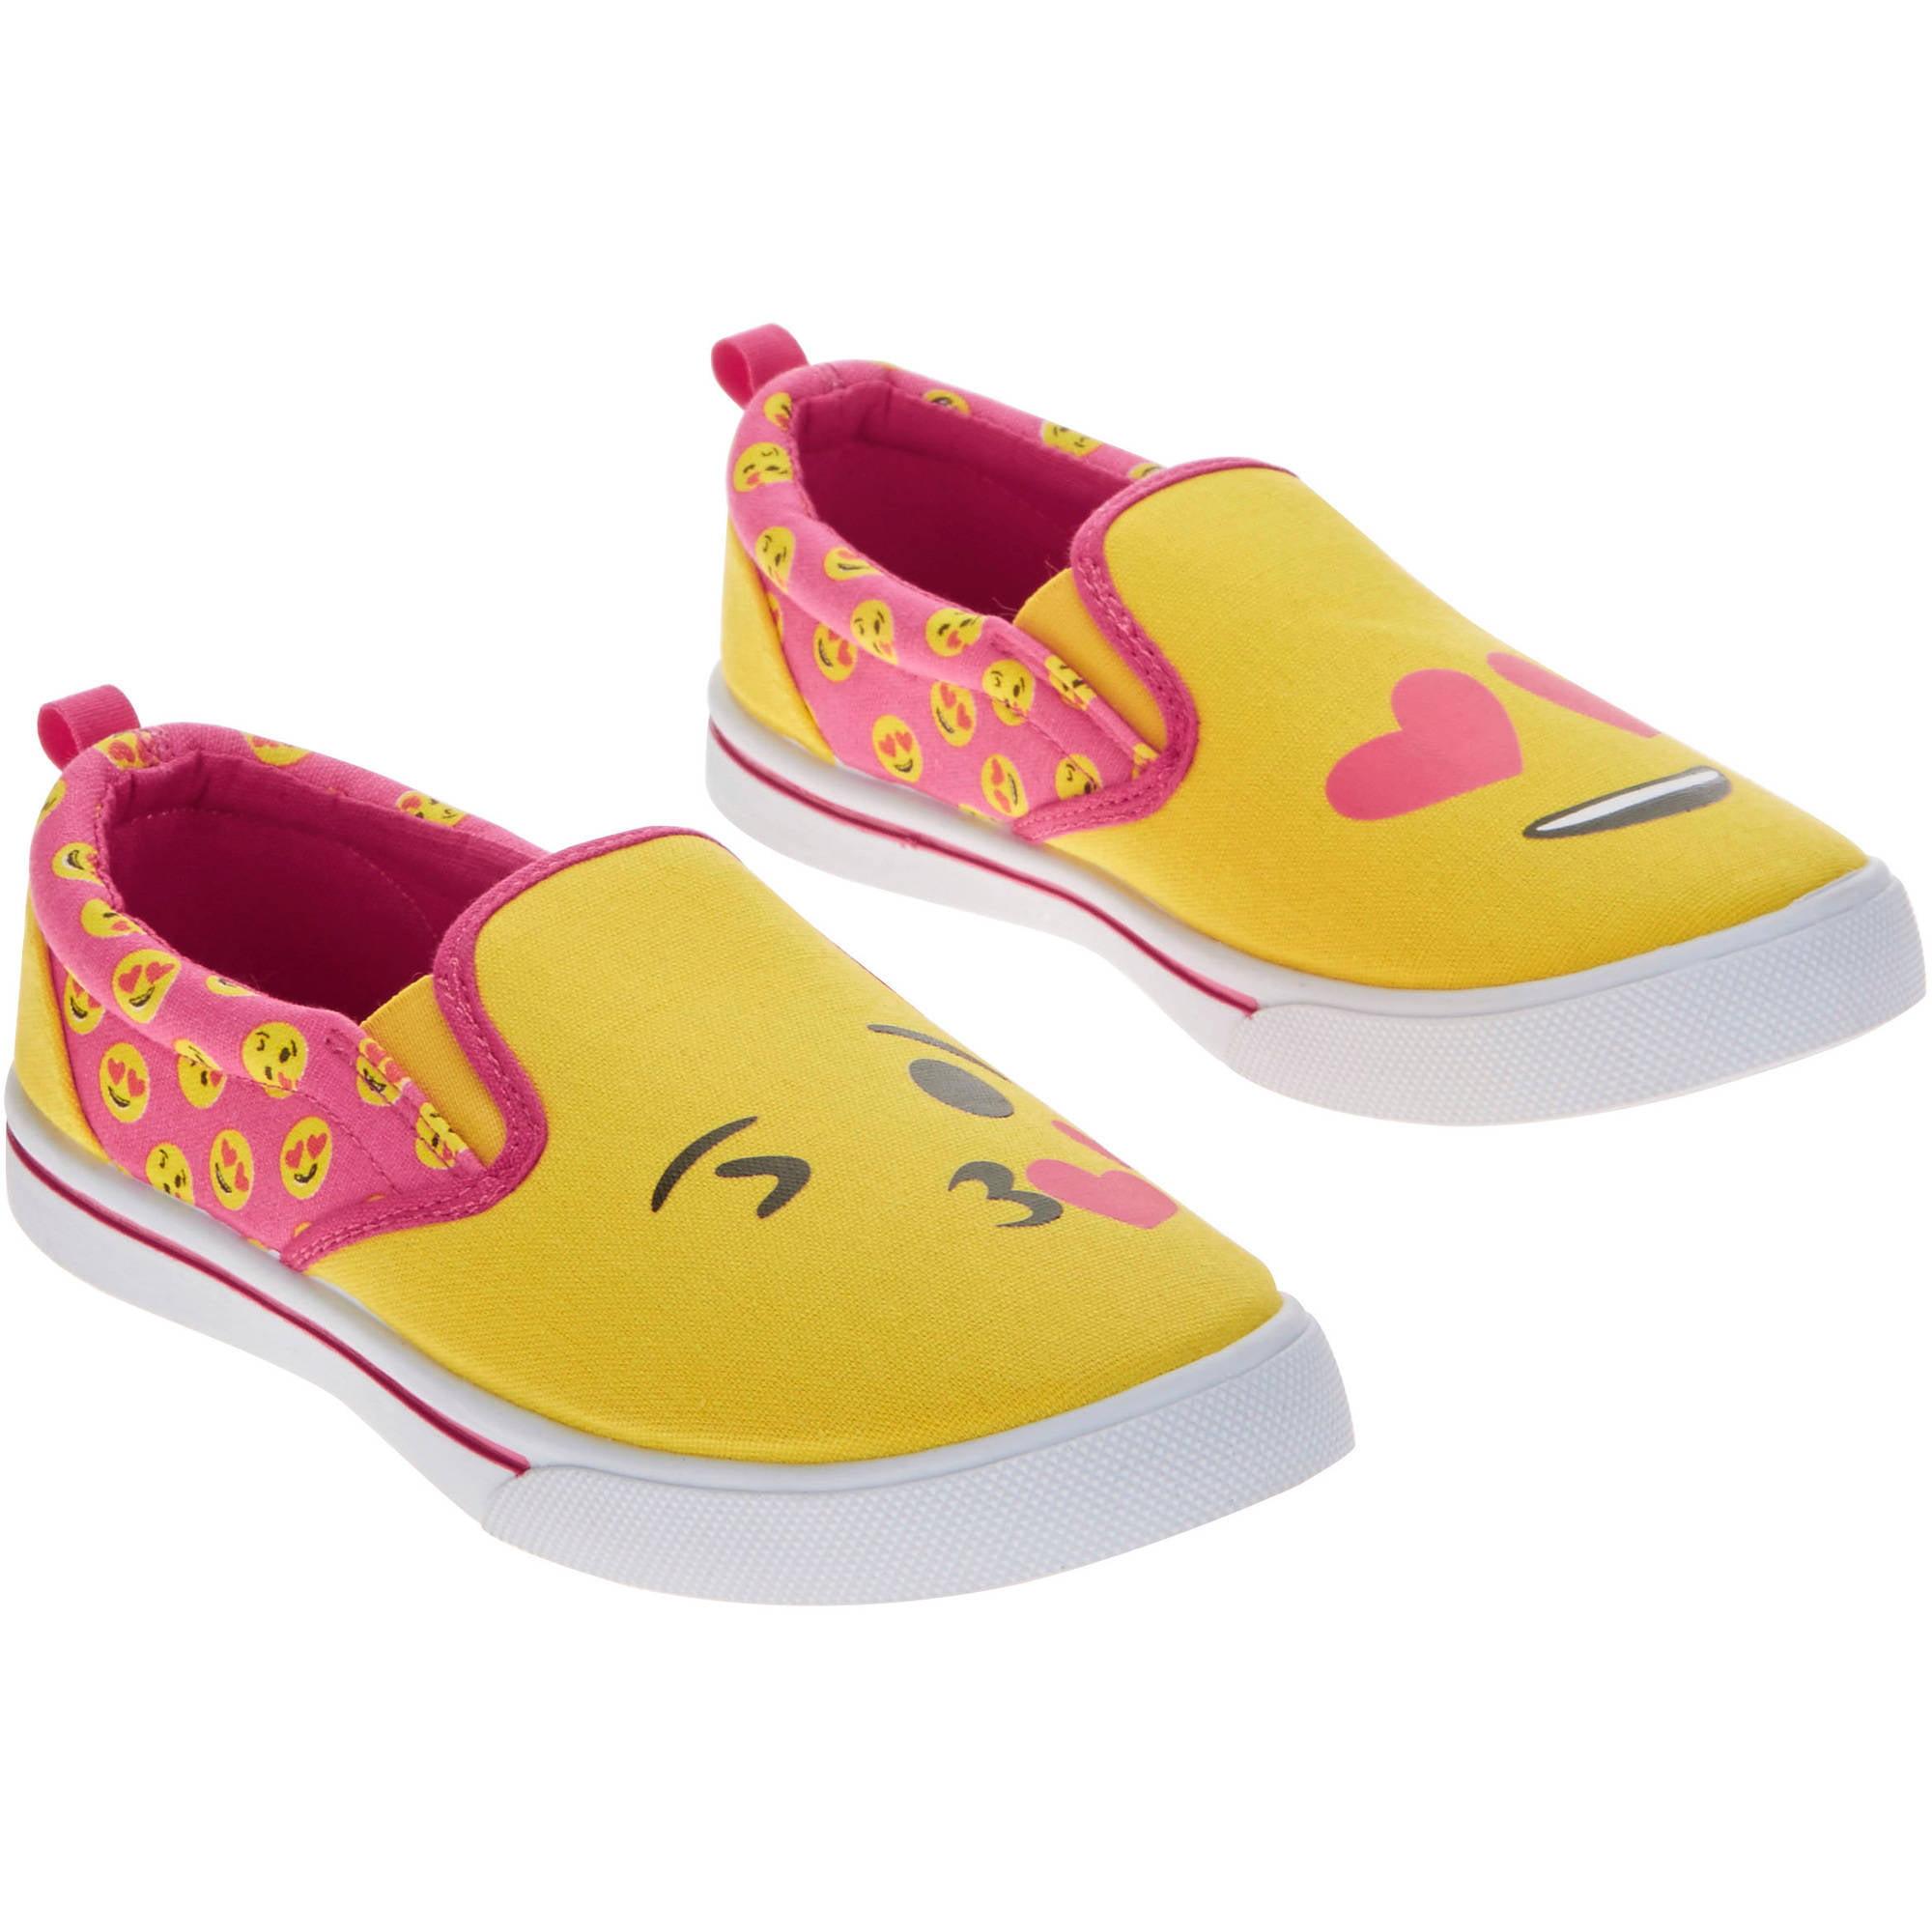 Girls\' Canvas Twin-Gore Slip-on Casual Shoe - Walmart.com